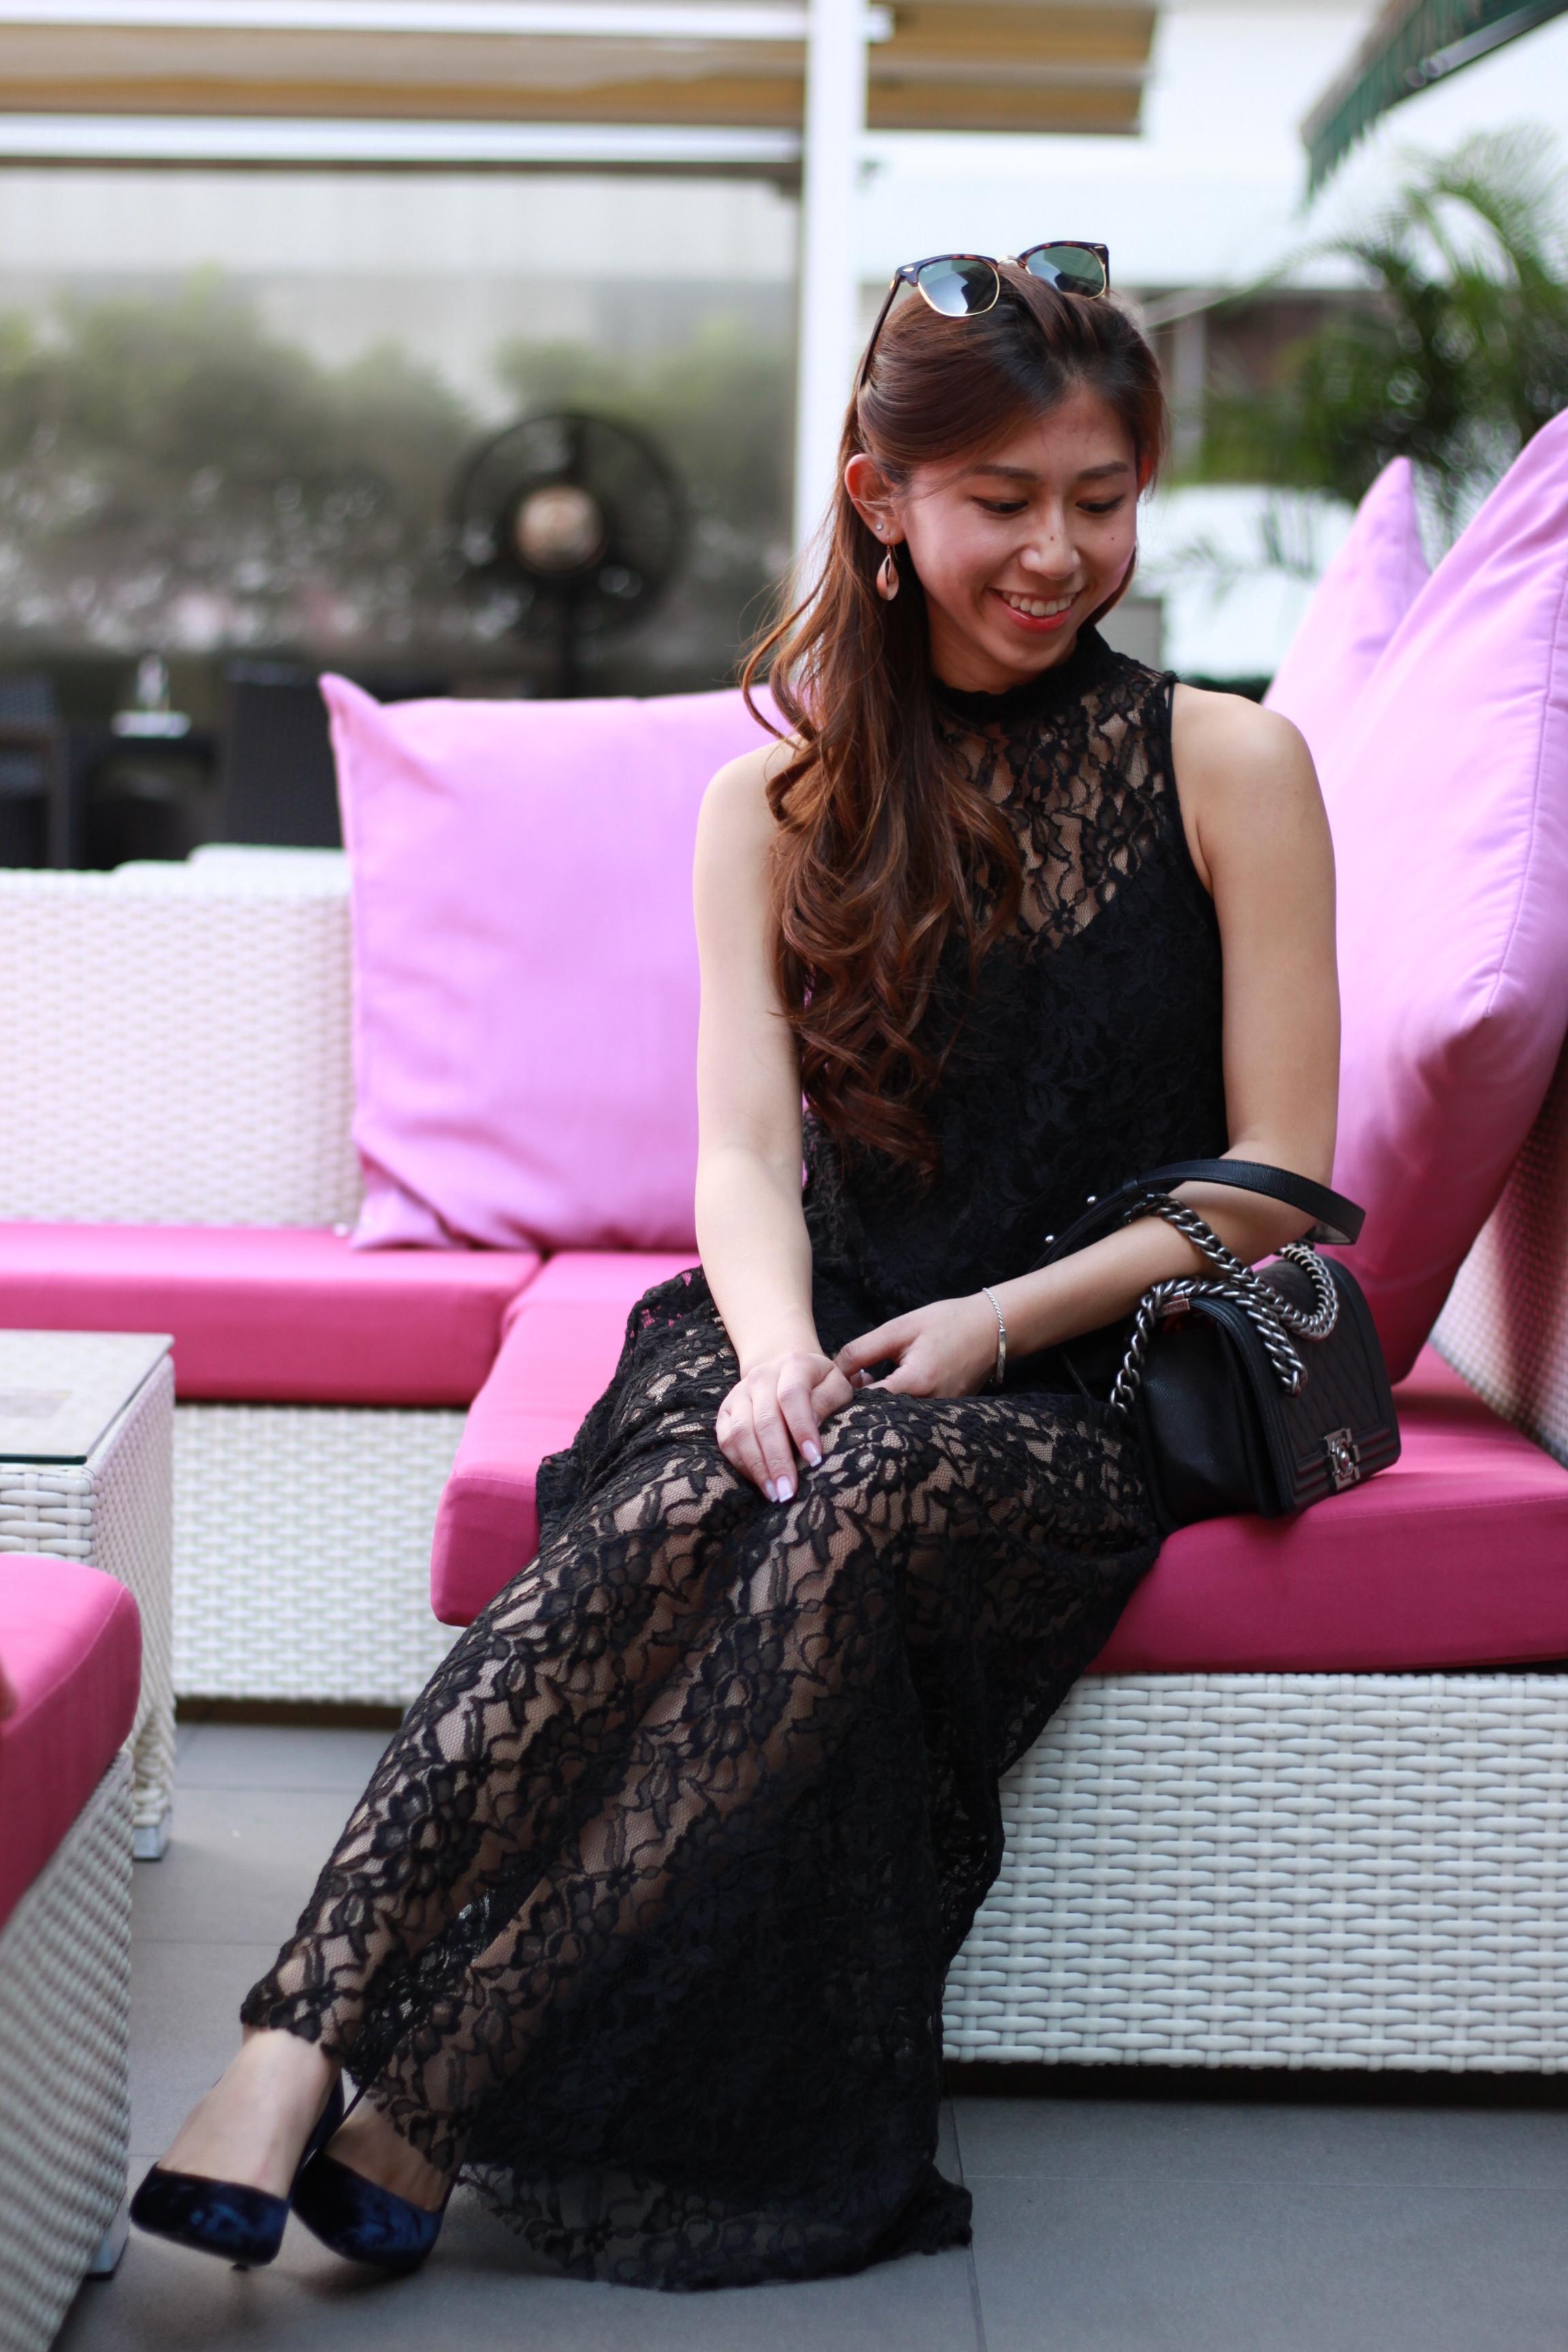 On me: Zara black lace maxi / Prada velvet pumps / Chanel Boy On JongSin: Zara green lace top / Denim jeans / Stuart Weitzman over-the-knee boots / Givenchy On JoyceSi: